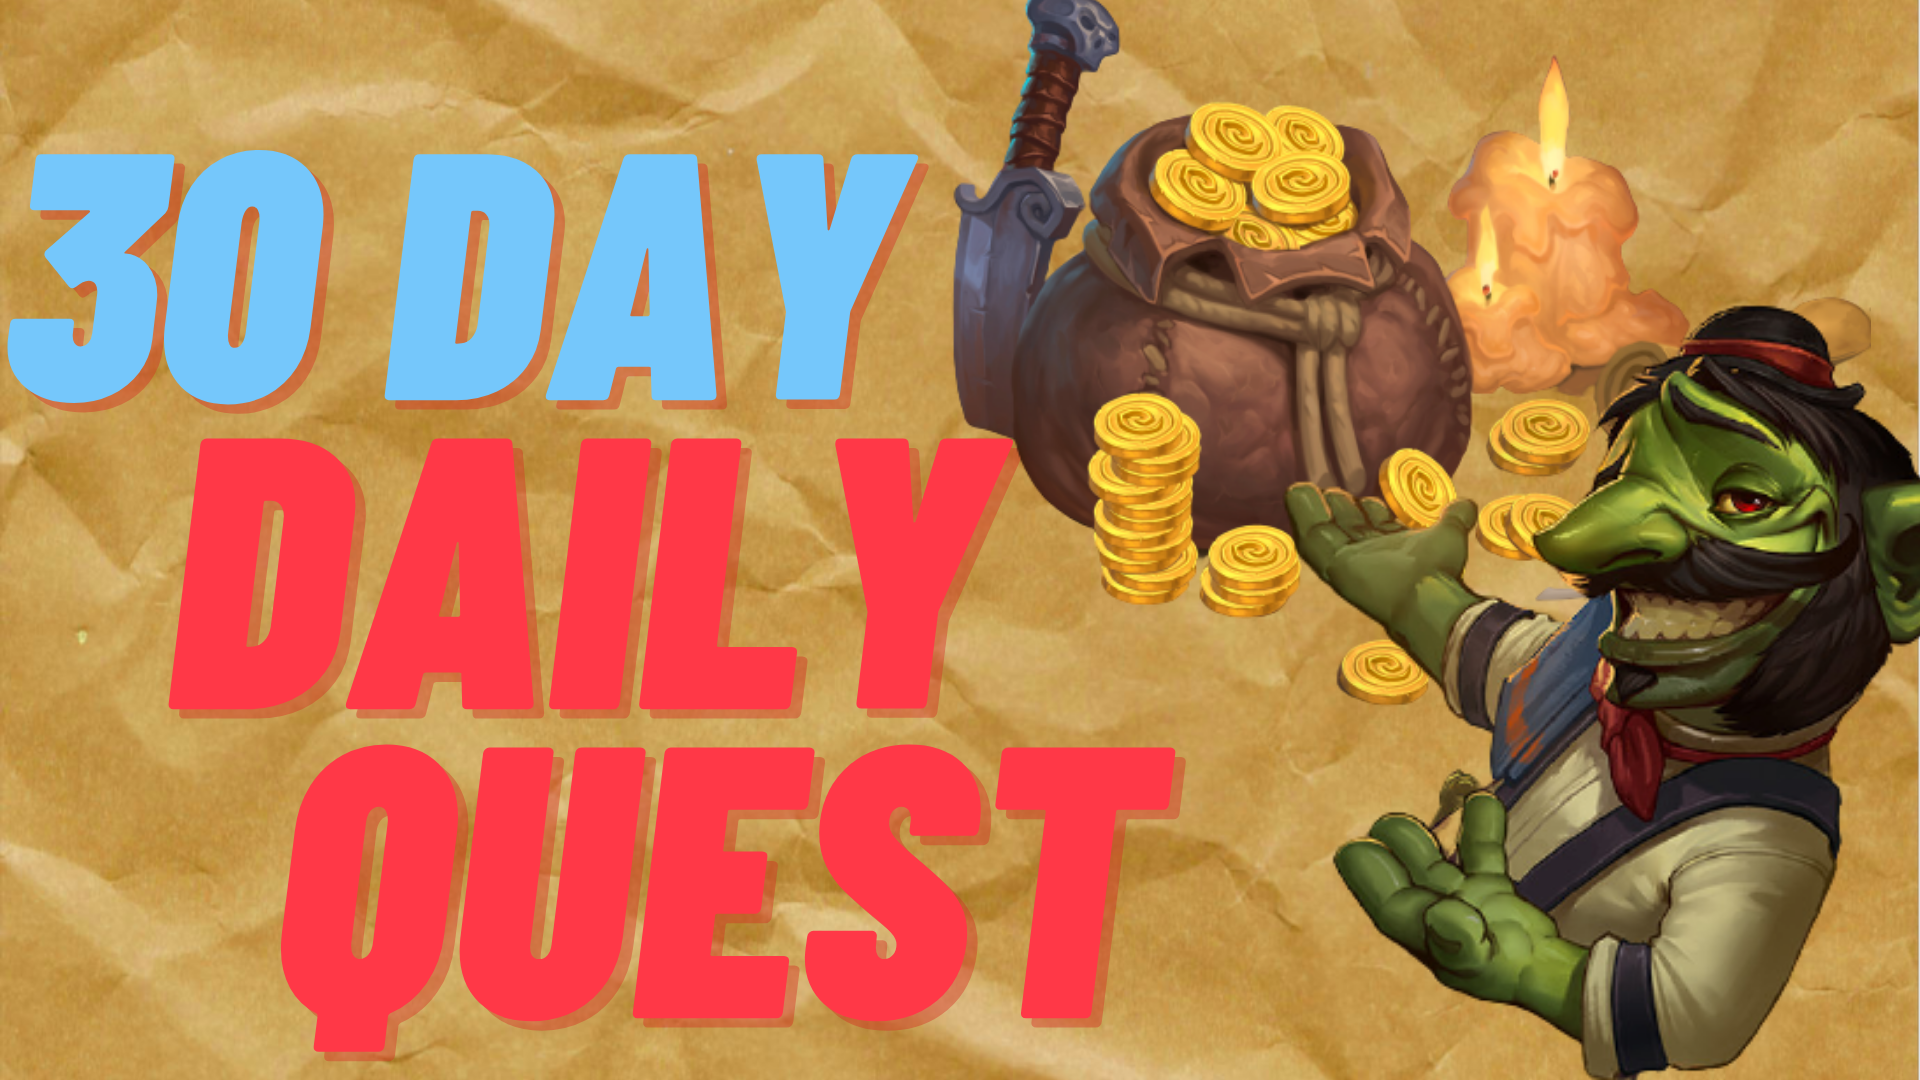 30-Day Daily Quests GBD - e2p.com